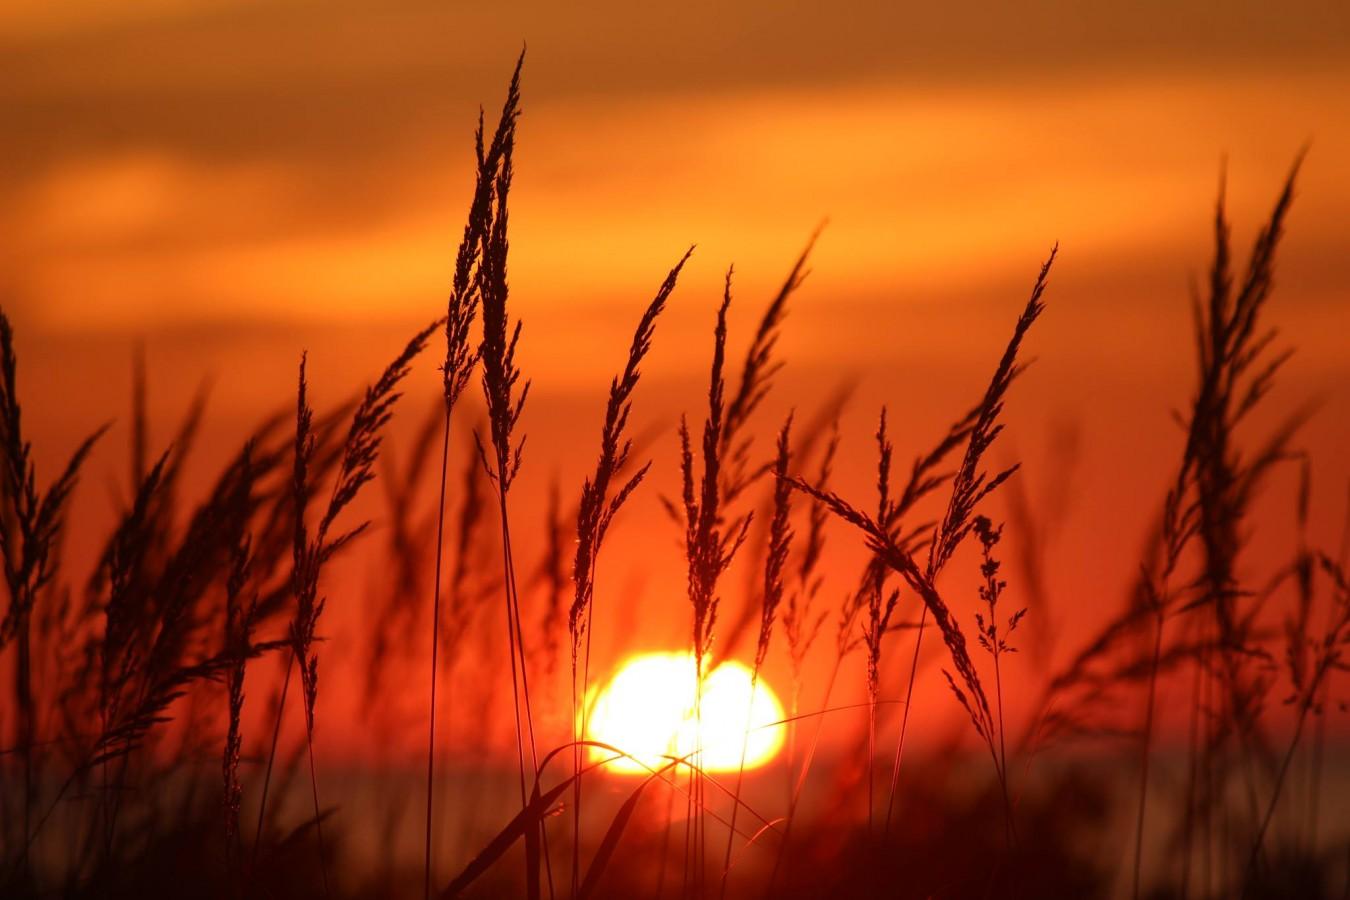 James macLellan_Hayfield through the sunset_Facebook_Aug 2